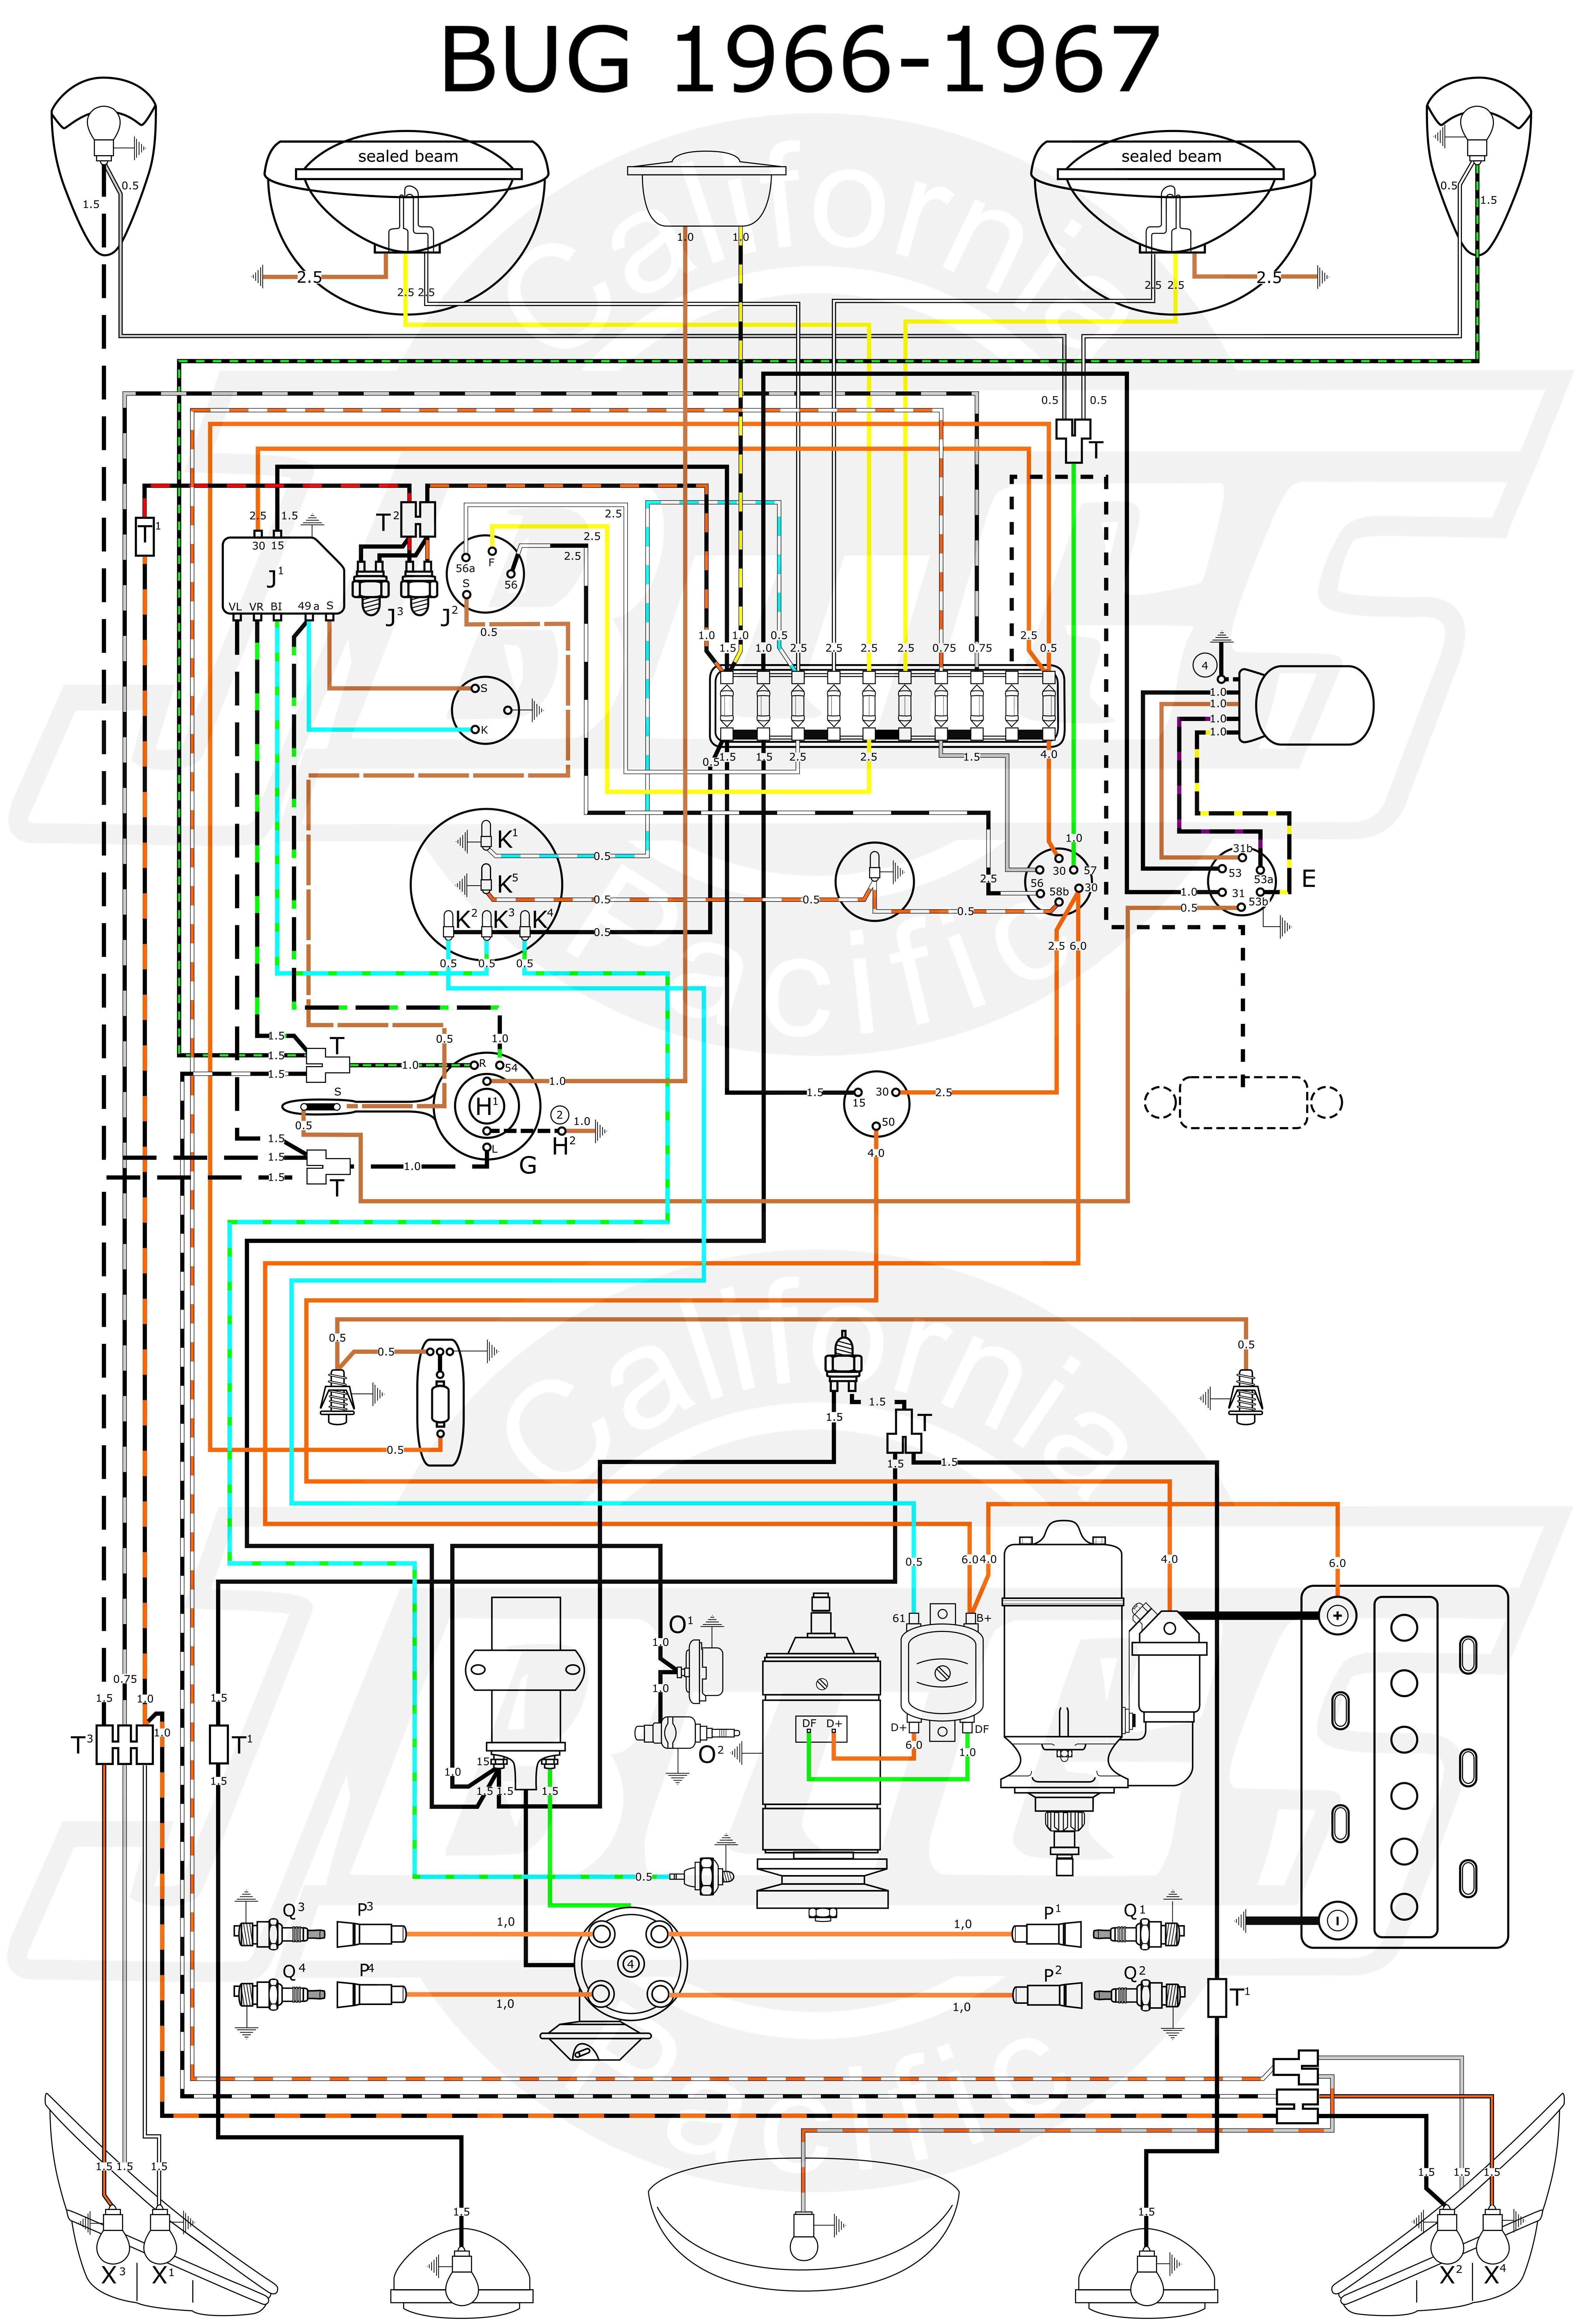 Diagram Diagramtemplate Diagramsample Vw Parts Vw Beetle Classic Volkswagen Car